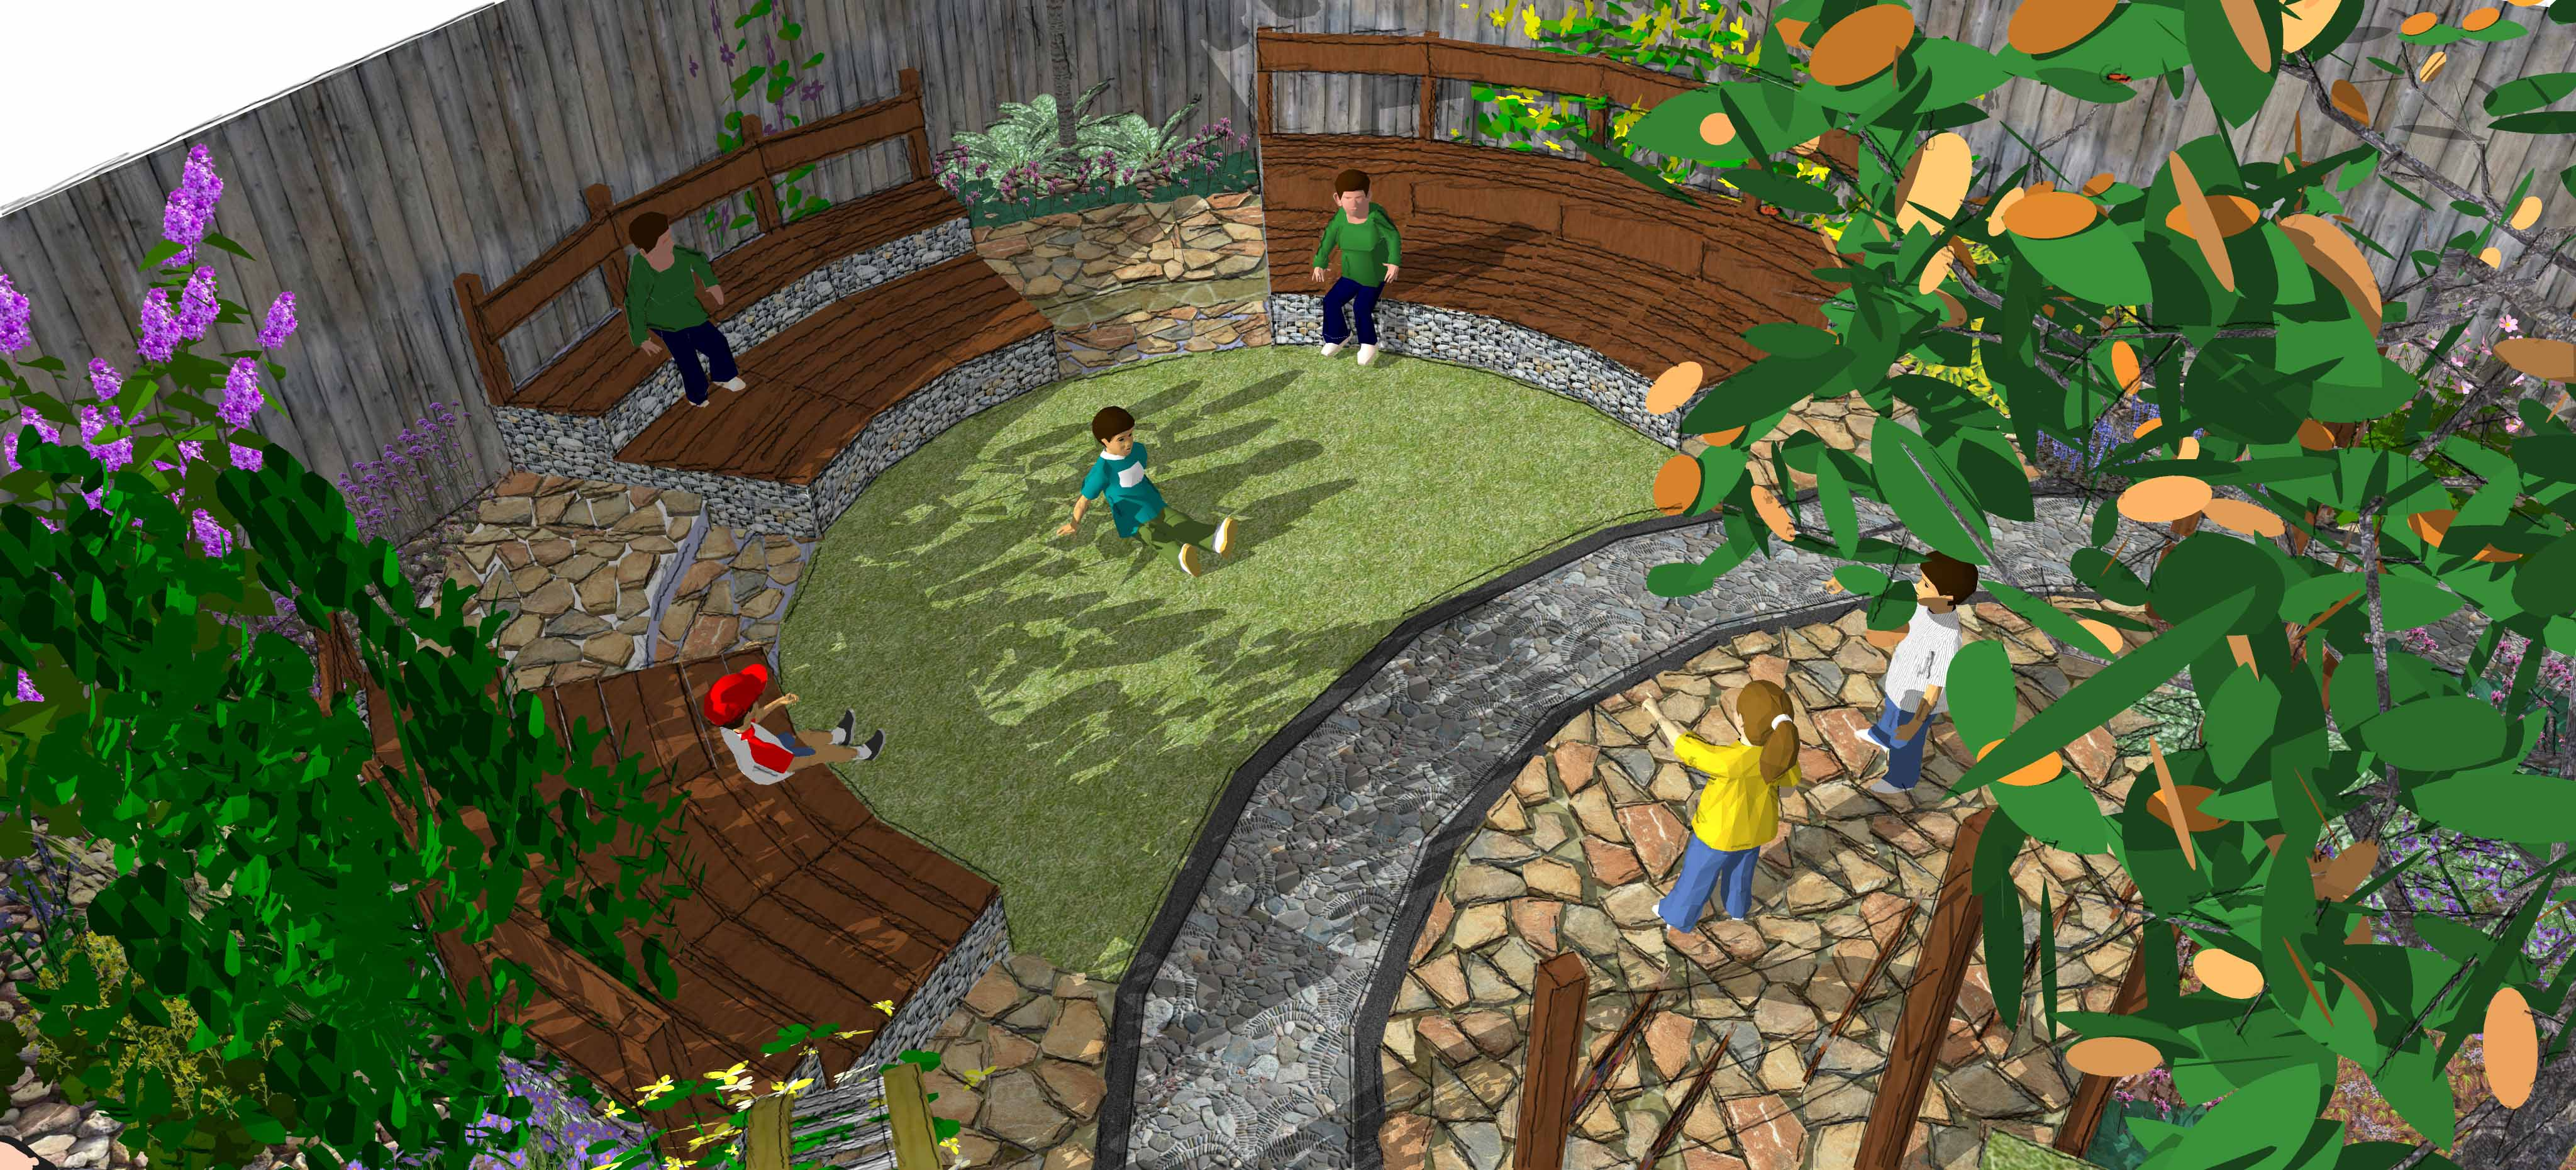 Earth Designs - school garden design ampitheatre blog